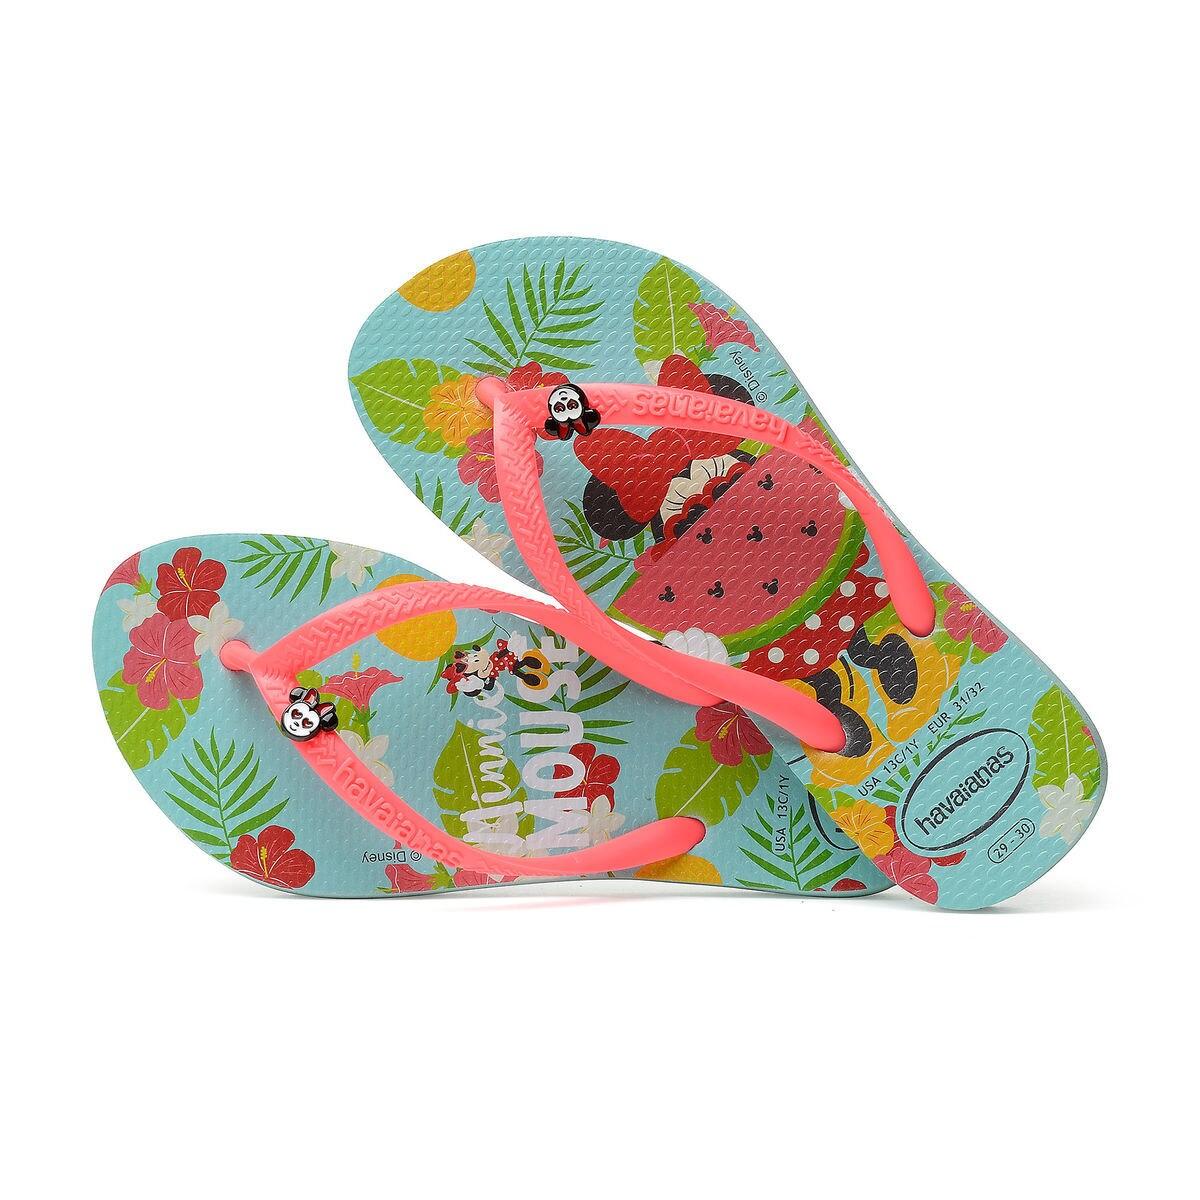 75b78fdbe23afa Minnie Mouse Tropical Flip Flops for Kids by Havaianas